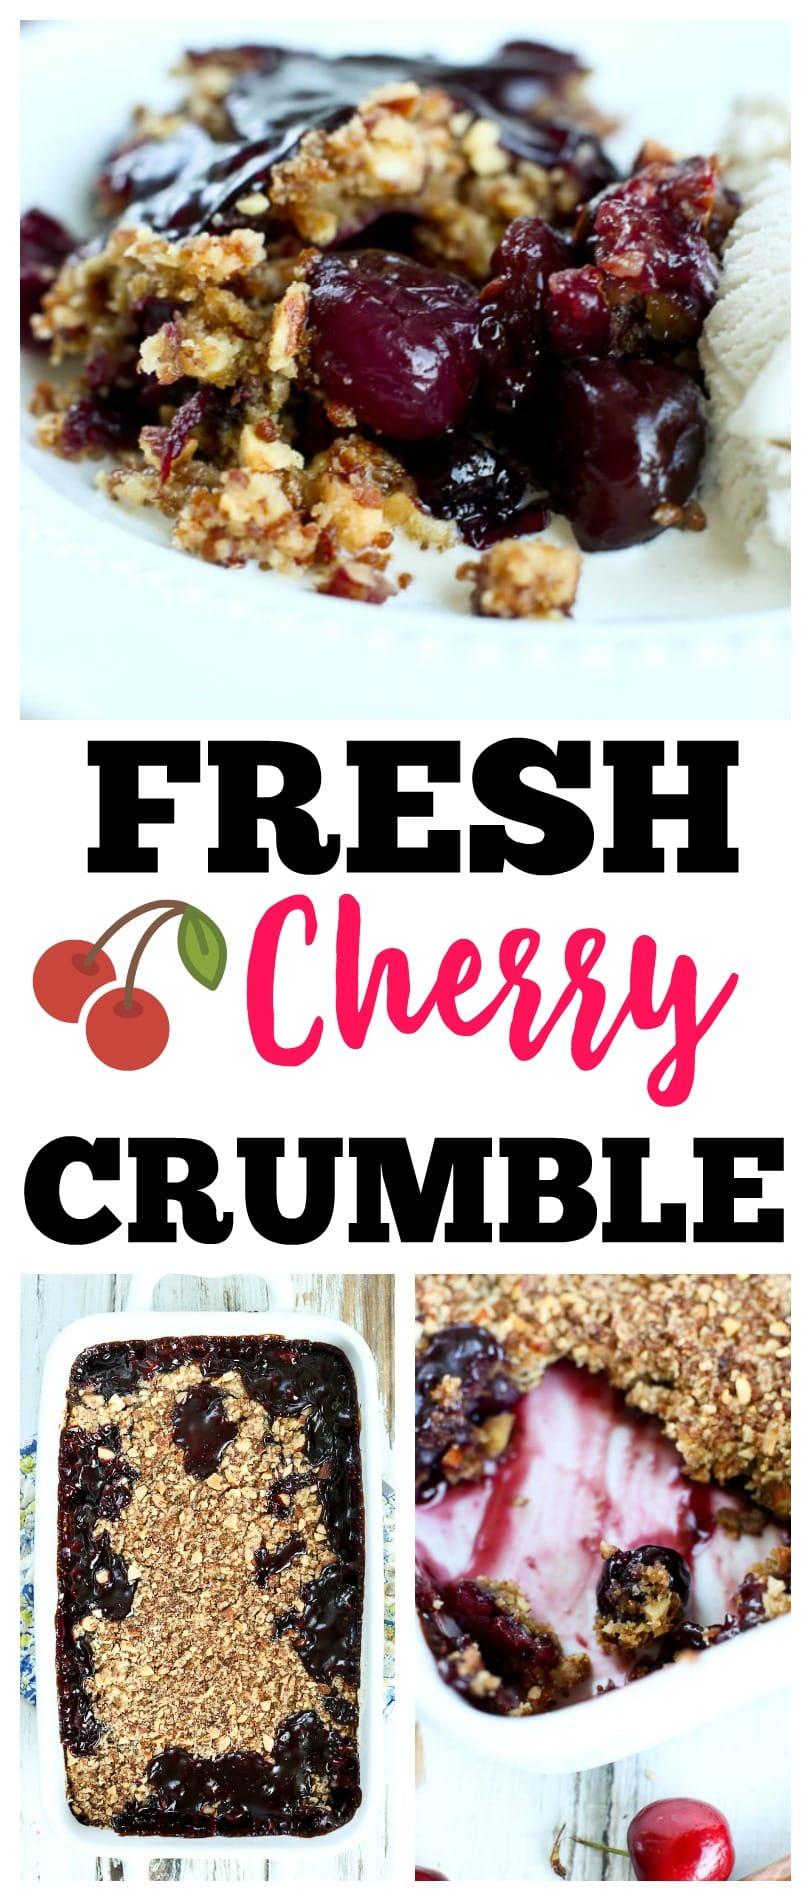 Fresh Cherry Crumble Recipe | summer dessert | fruit dessert | cherry desserts | healthy desserts | quick and easy desserts